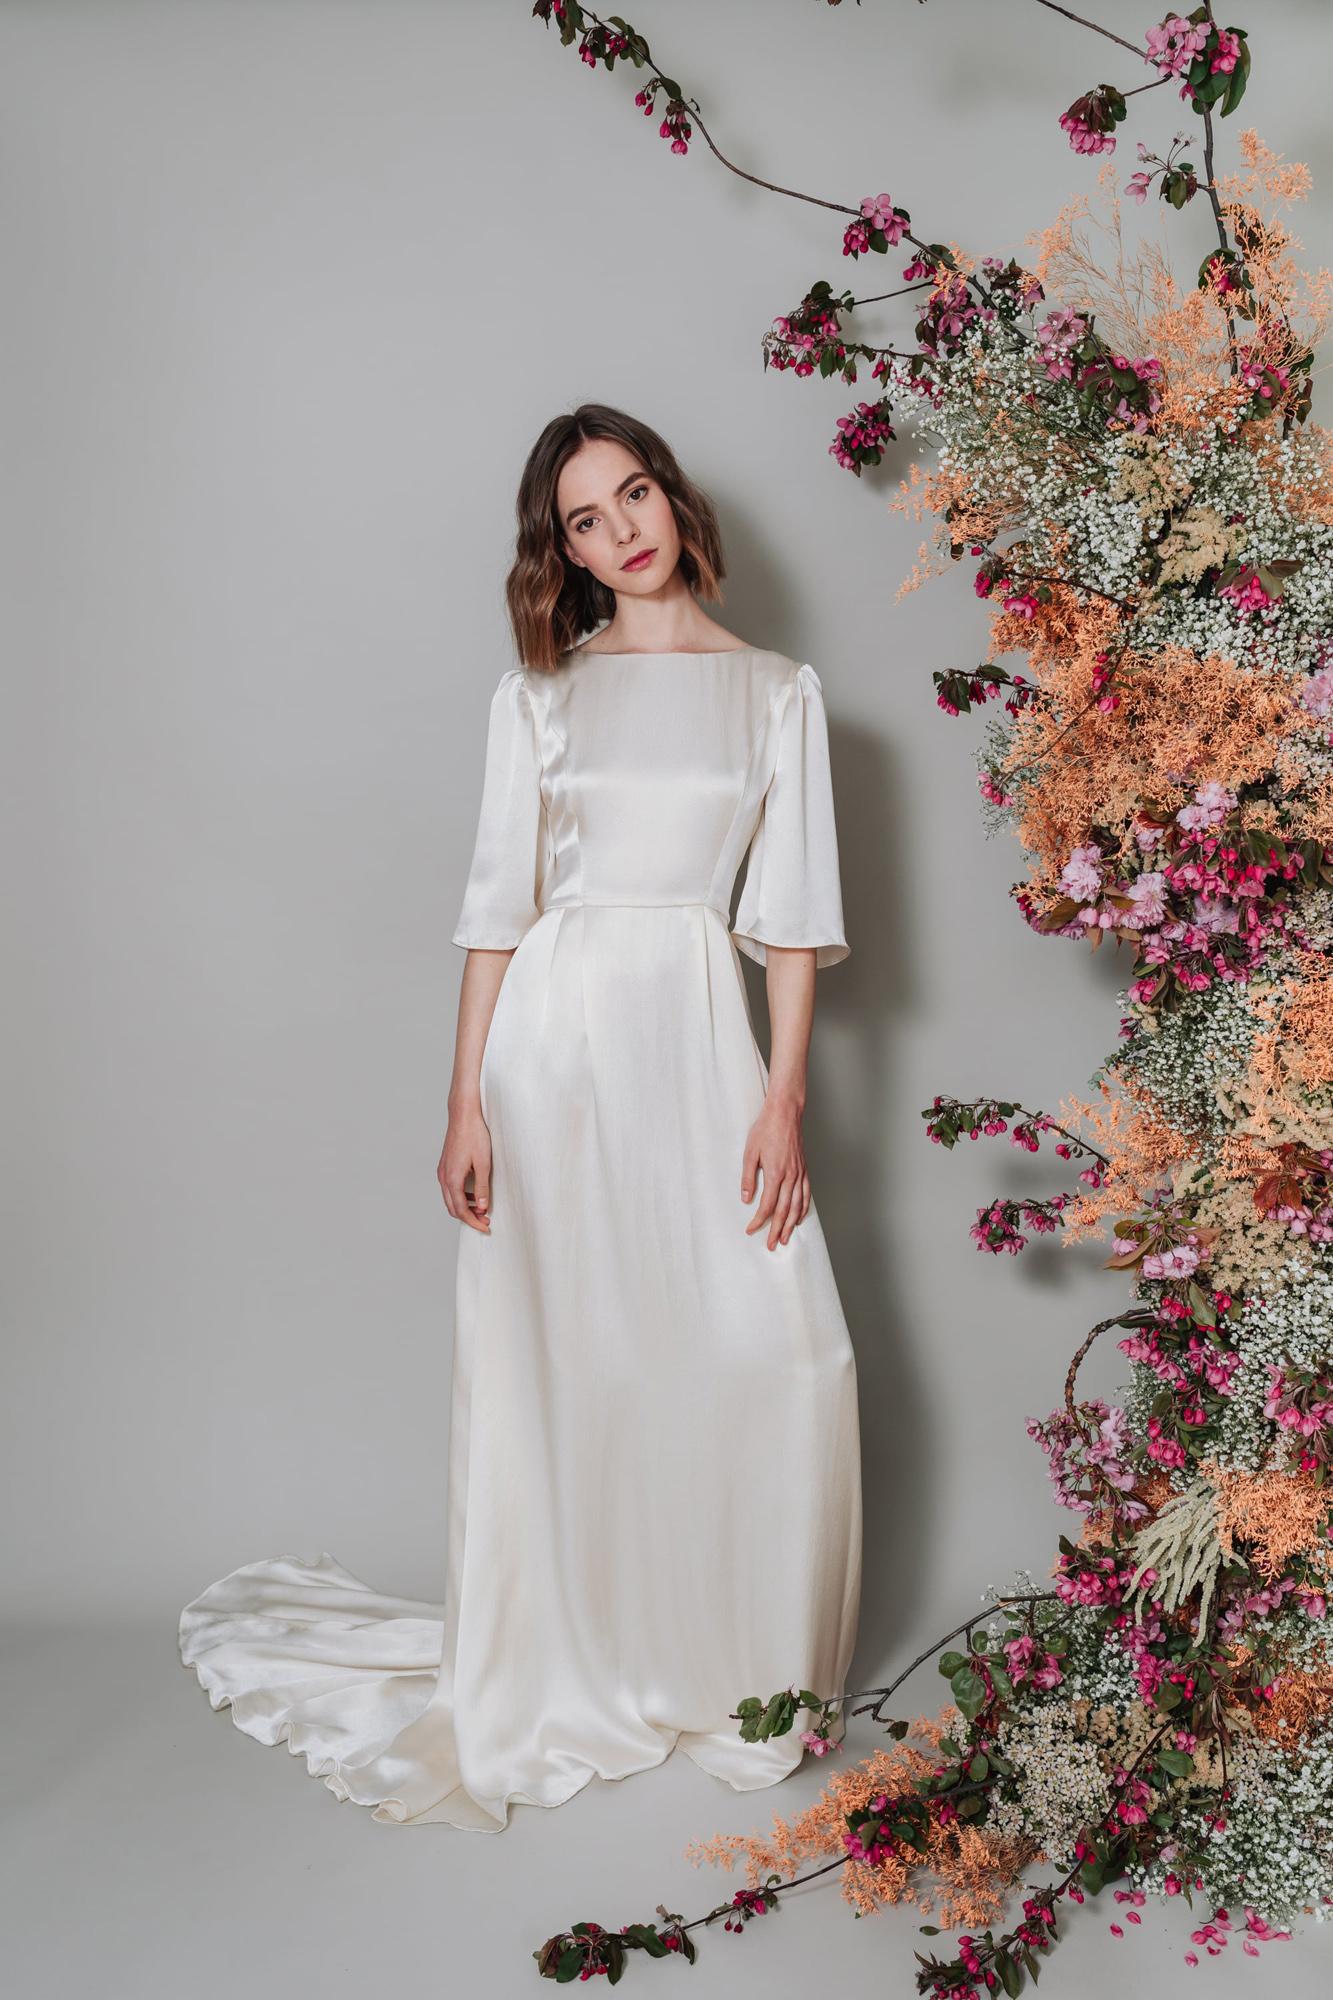 Kate-Beaumont-Lunaria-Bohemian-Hammered-Silk-Wedding-Dress-Sleeves-3.jpg